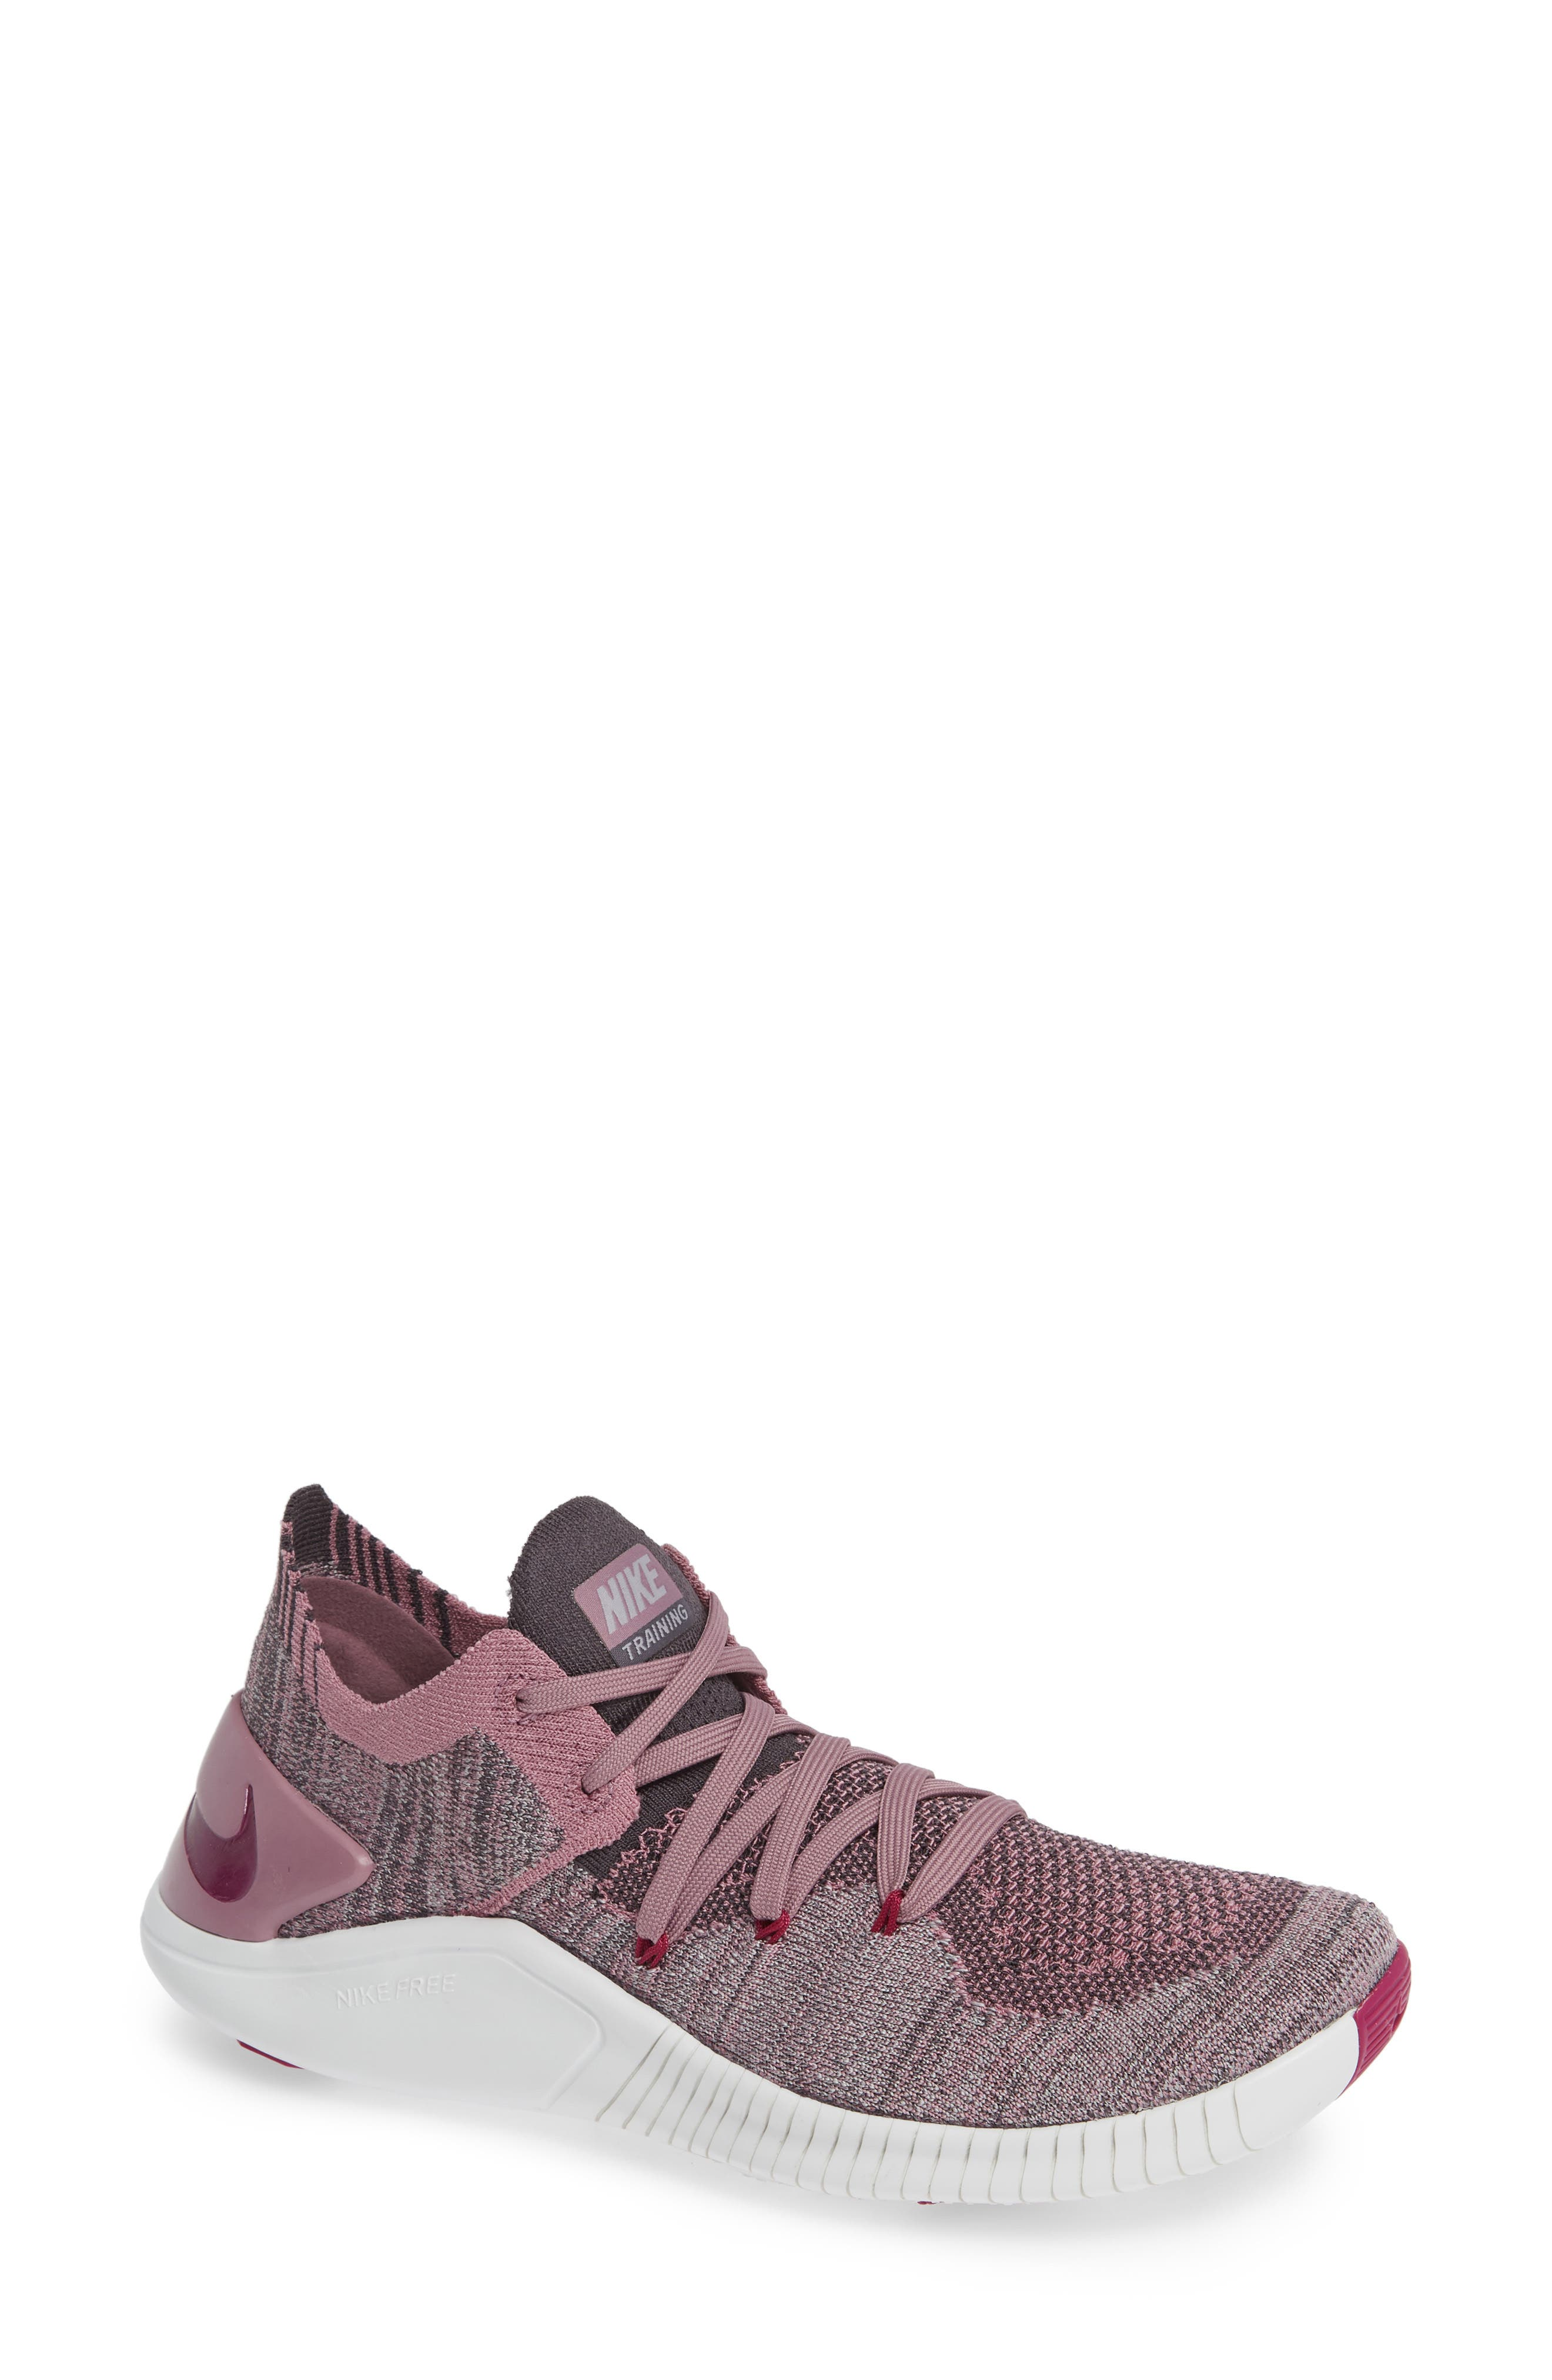 ec56b19fa3cf Nike Free Run